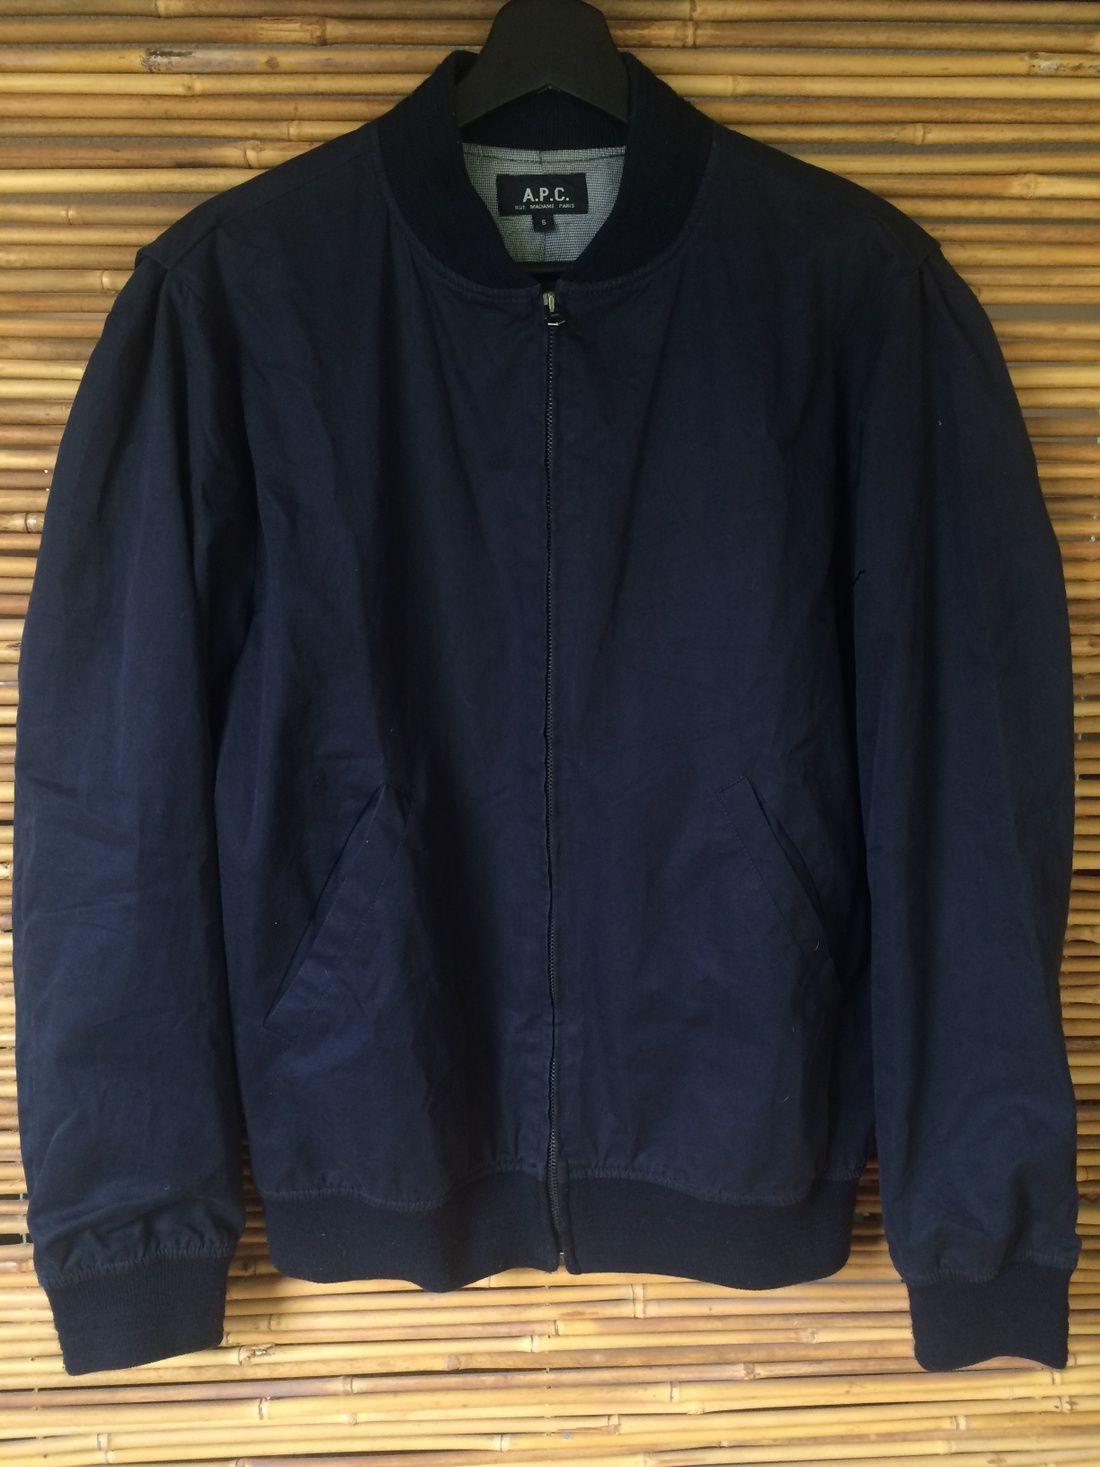 A P C Ma 1 Bomber Jacket Size S 205 Bomber Jacket Jackets Outerwear [ 1467 x 1100 Pixel ]